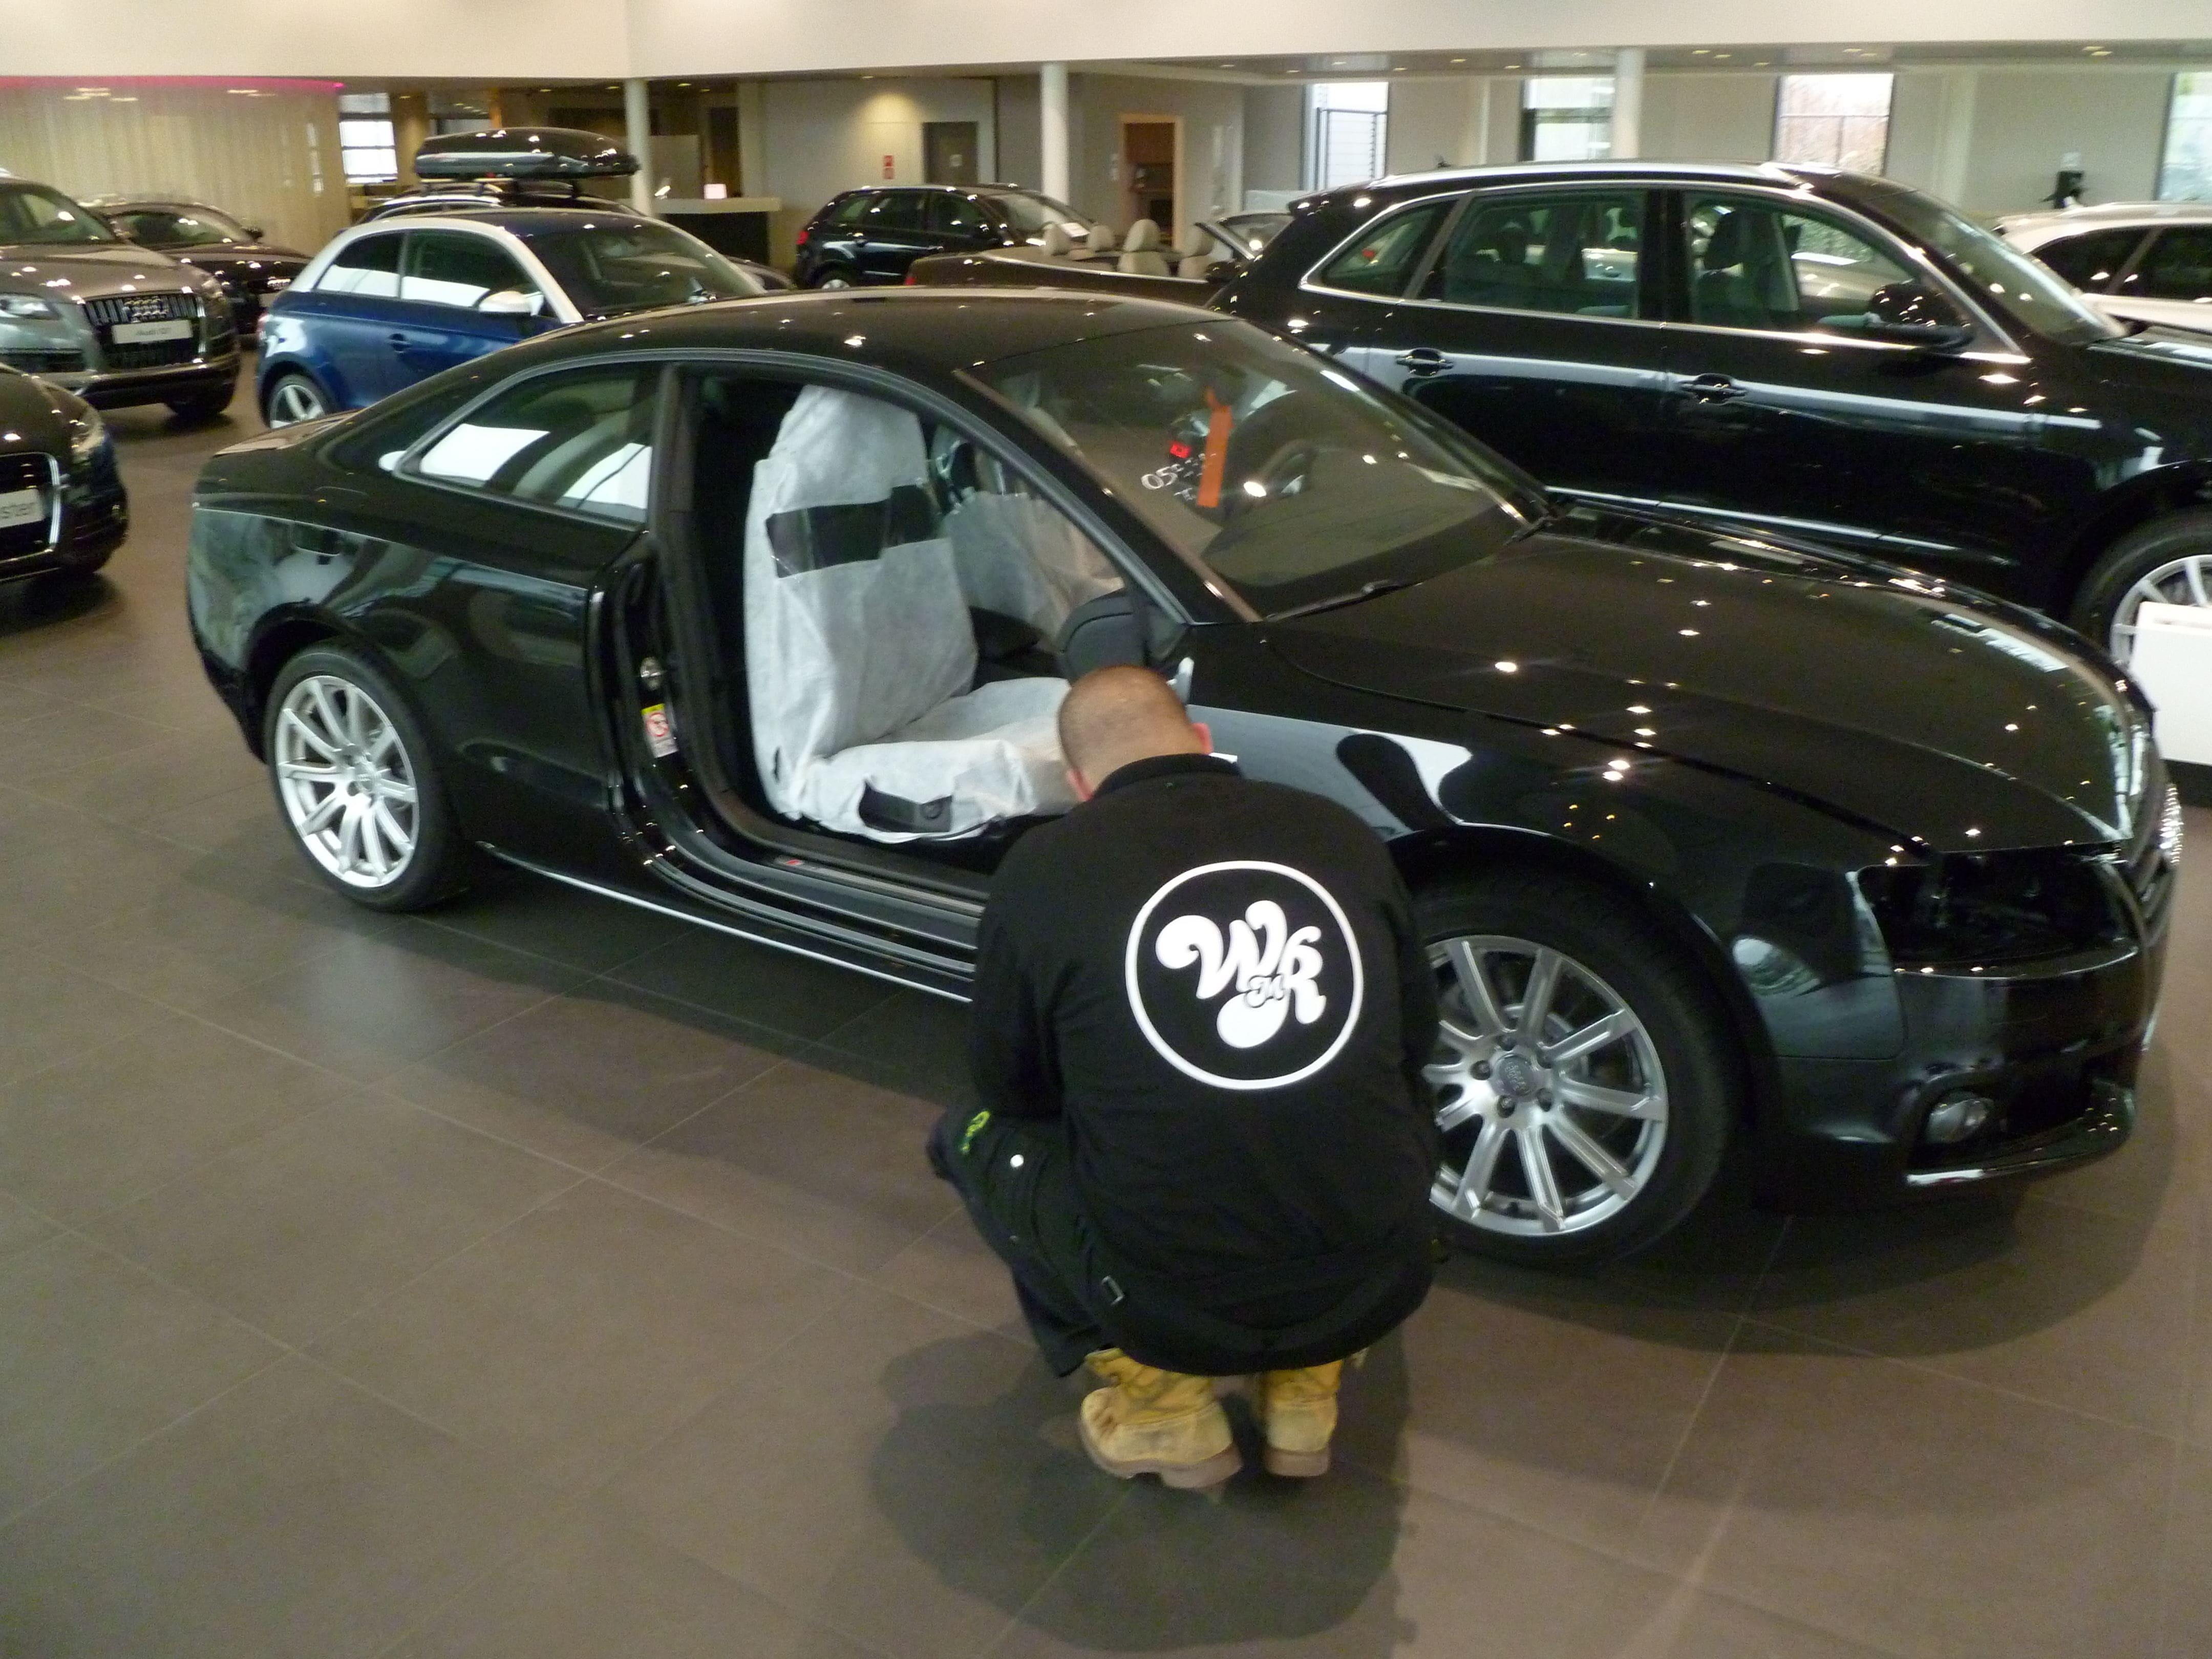 Audi A5 Coupe met Mat Zwarte Wrap, Carwrapping door Wrapmyride.nu Foto-nr:4615, ©2021